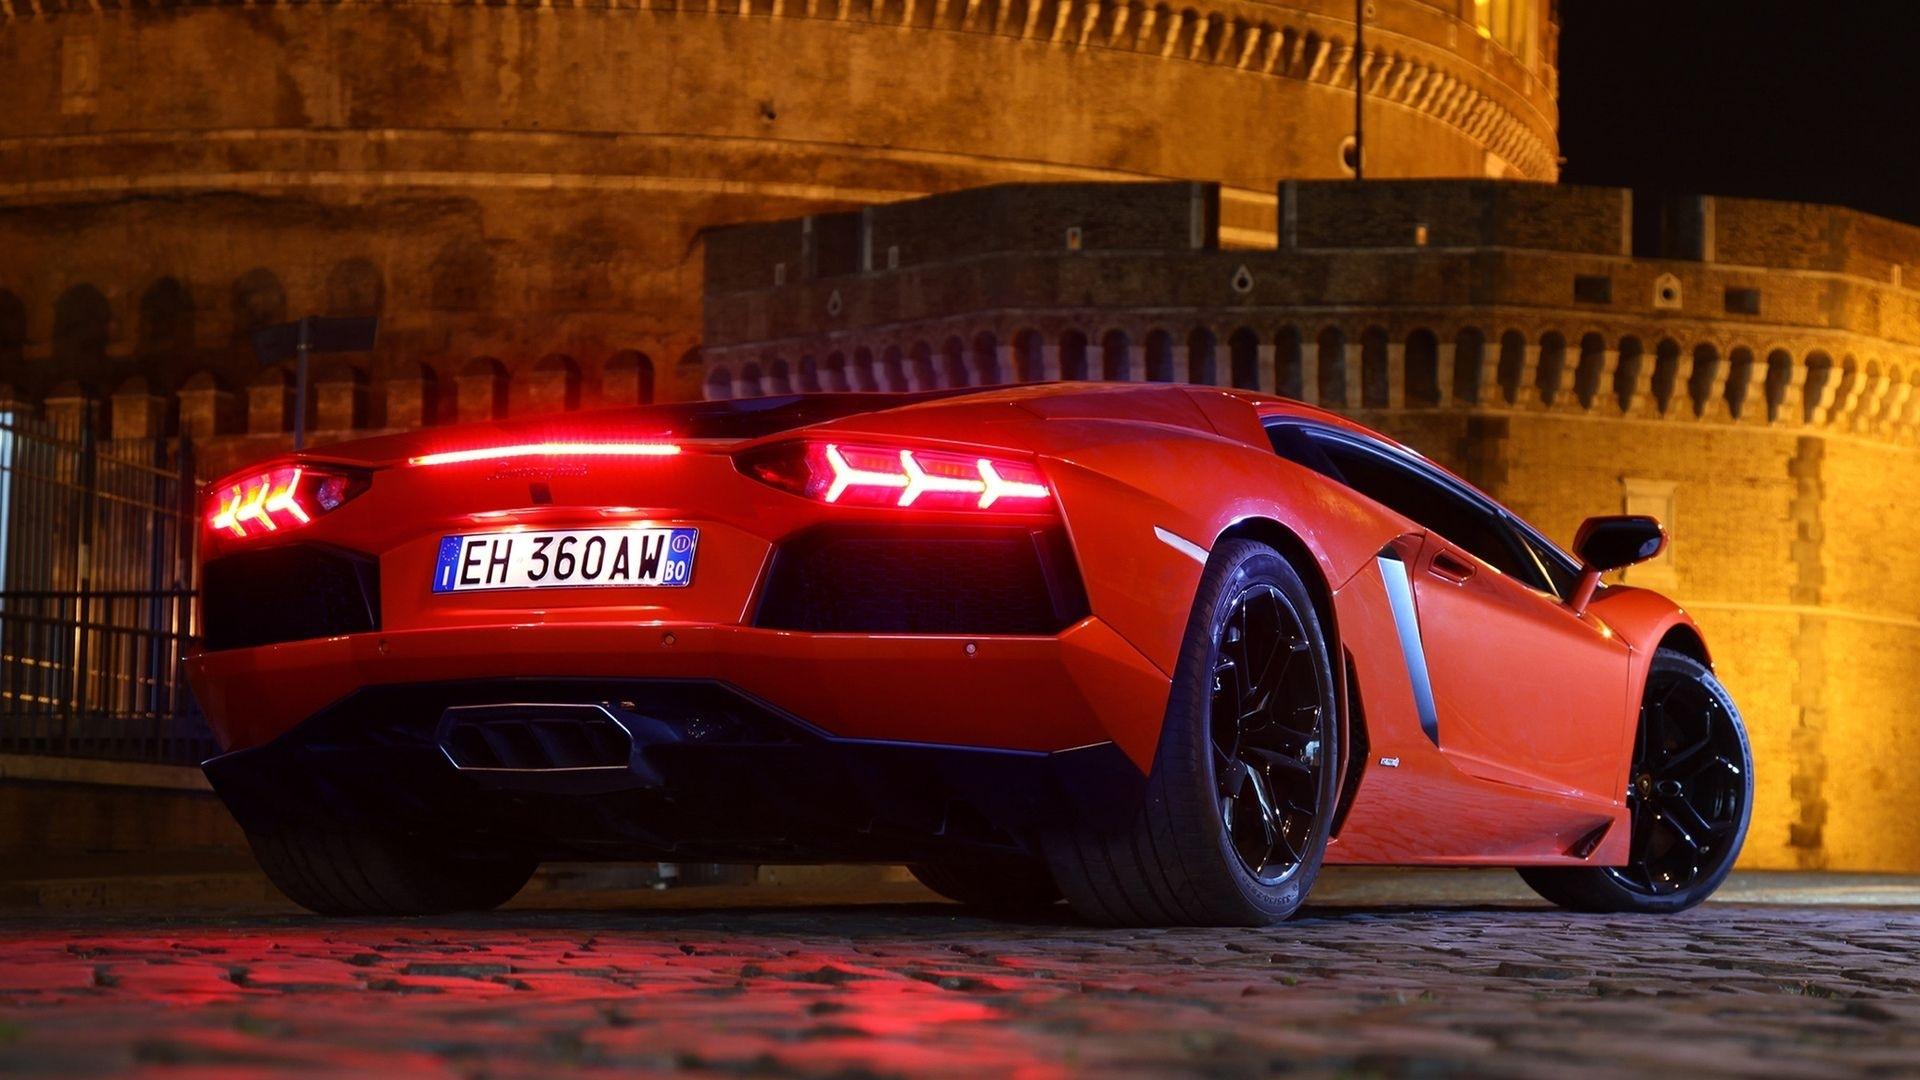 awesome car wallpaper hd 1080p free full pics desktop cars